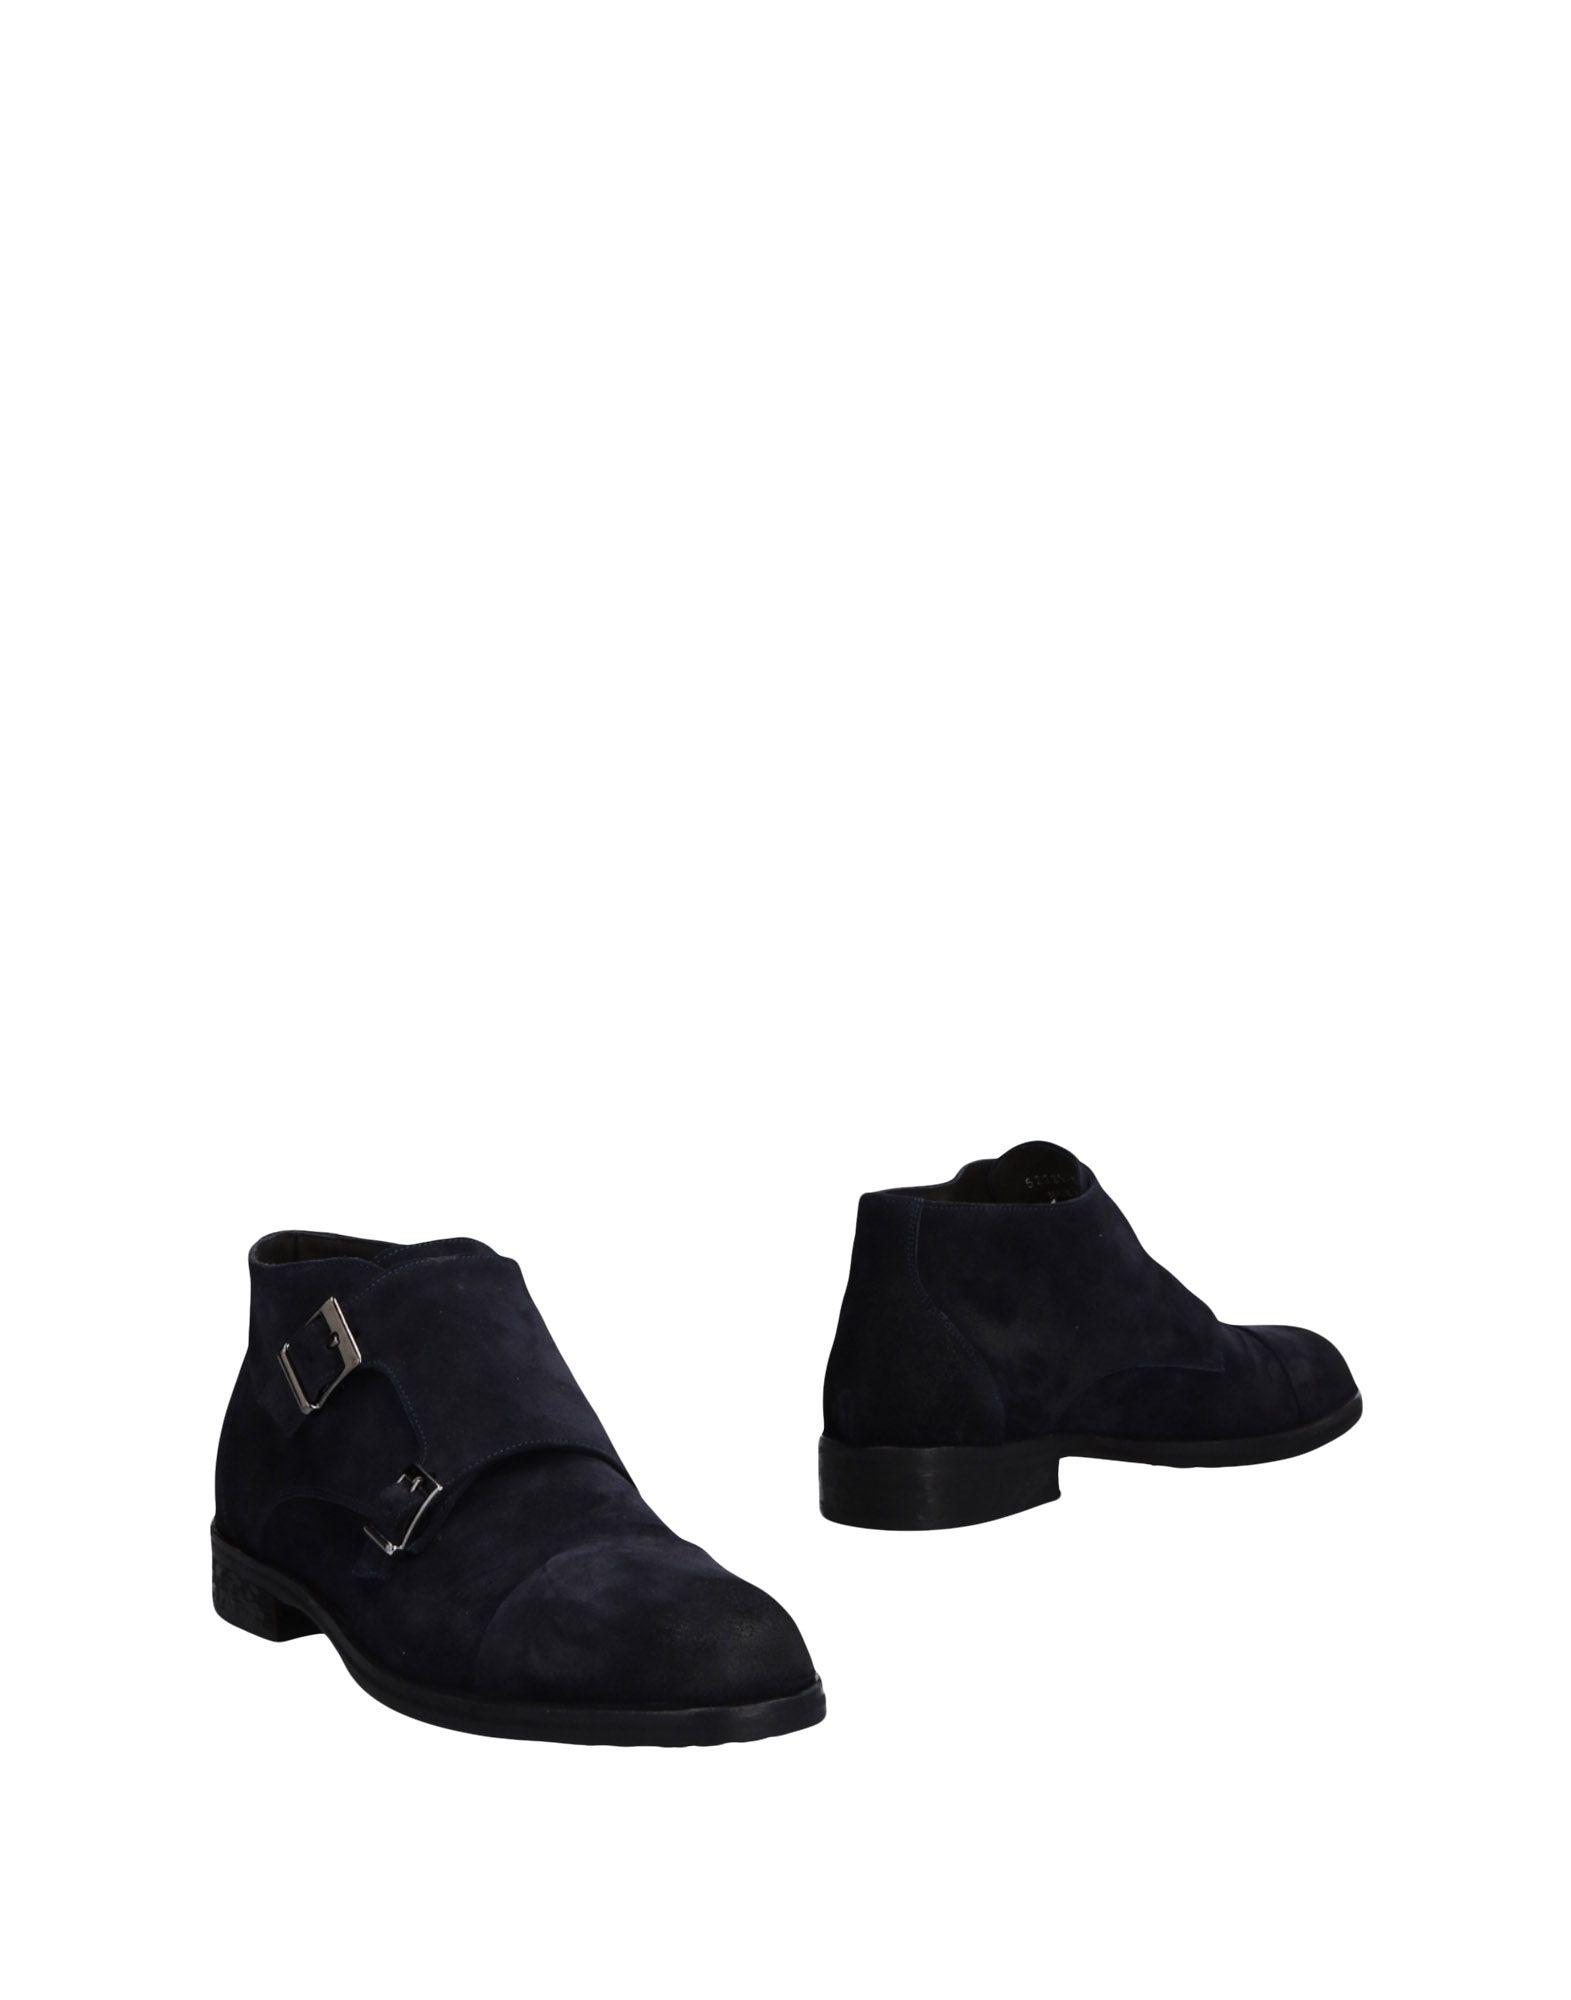 FLORSHEIM IMPERIAL Полусапоги и высокие ботинки цены онлайн